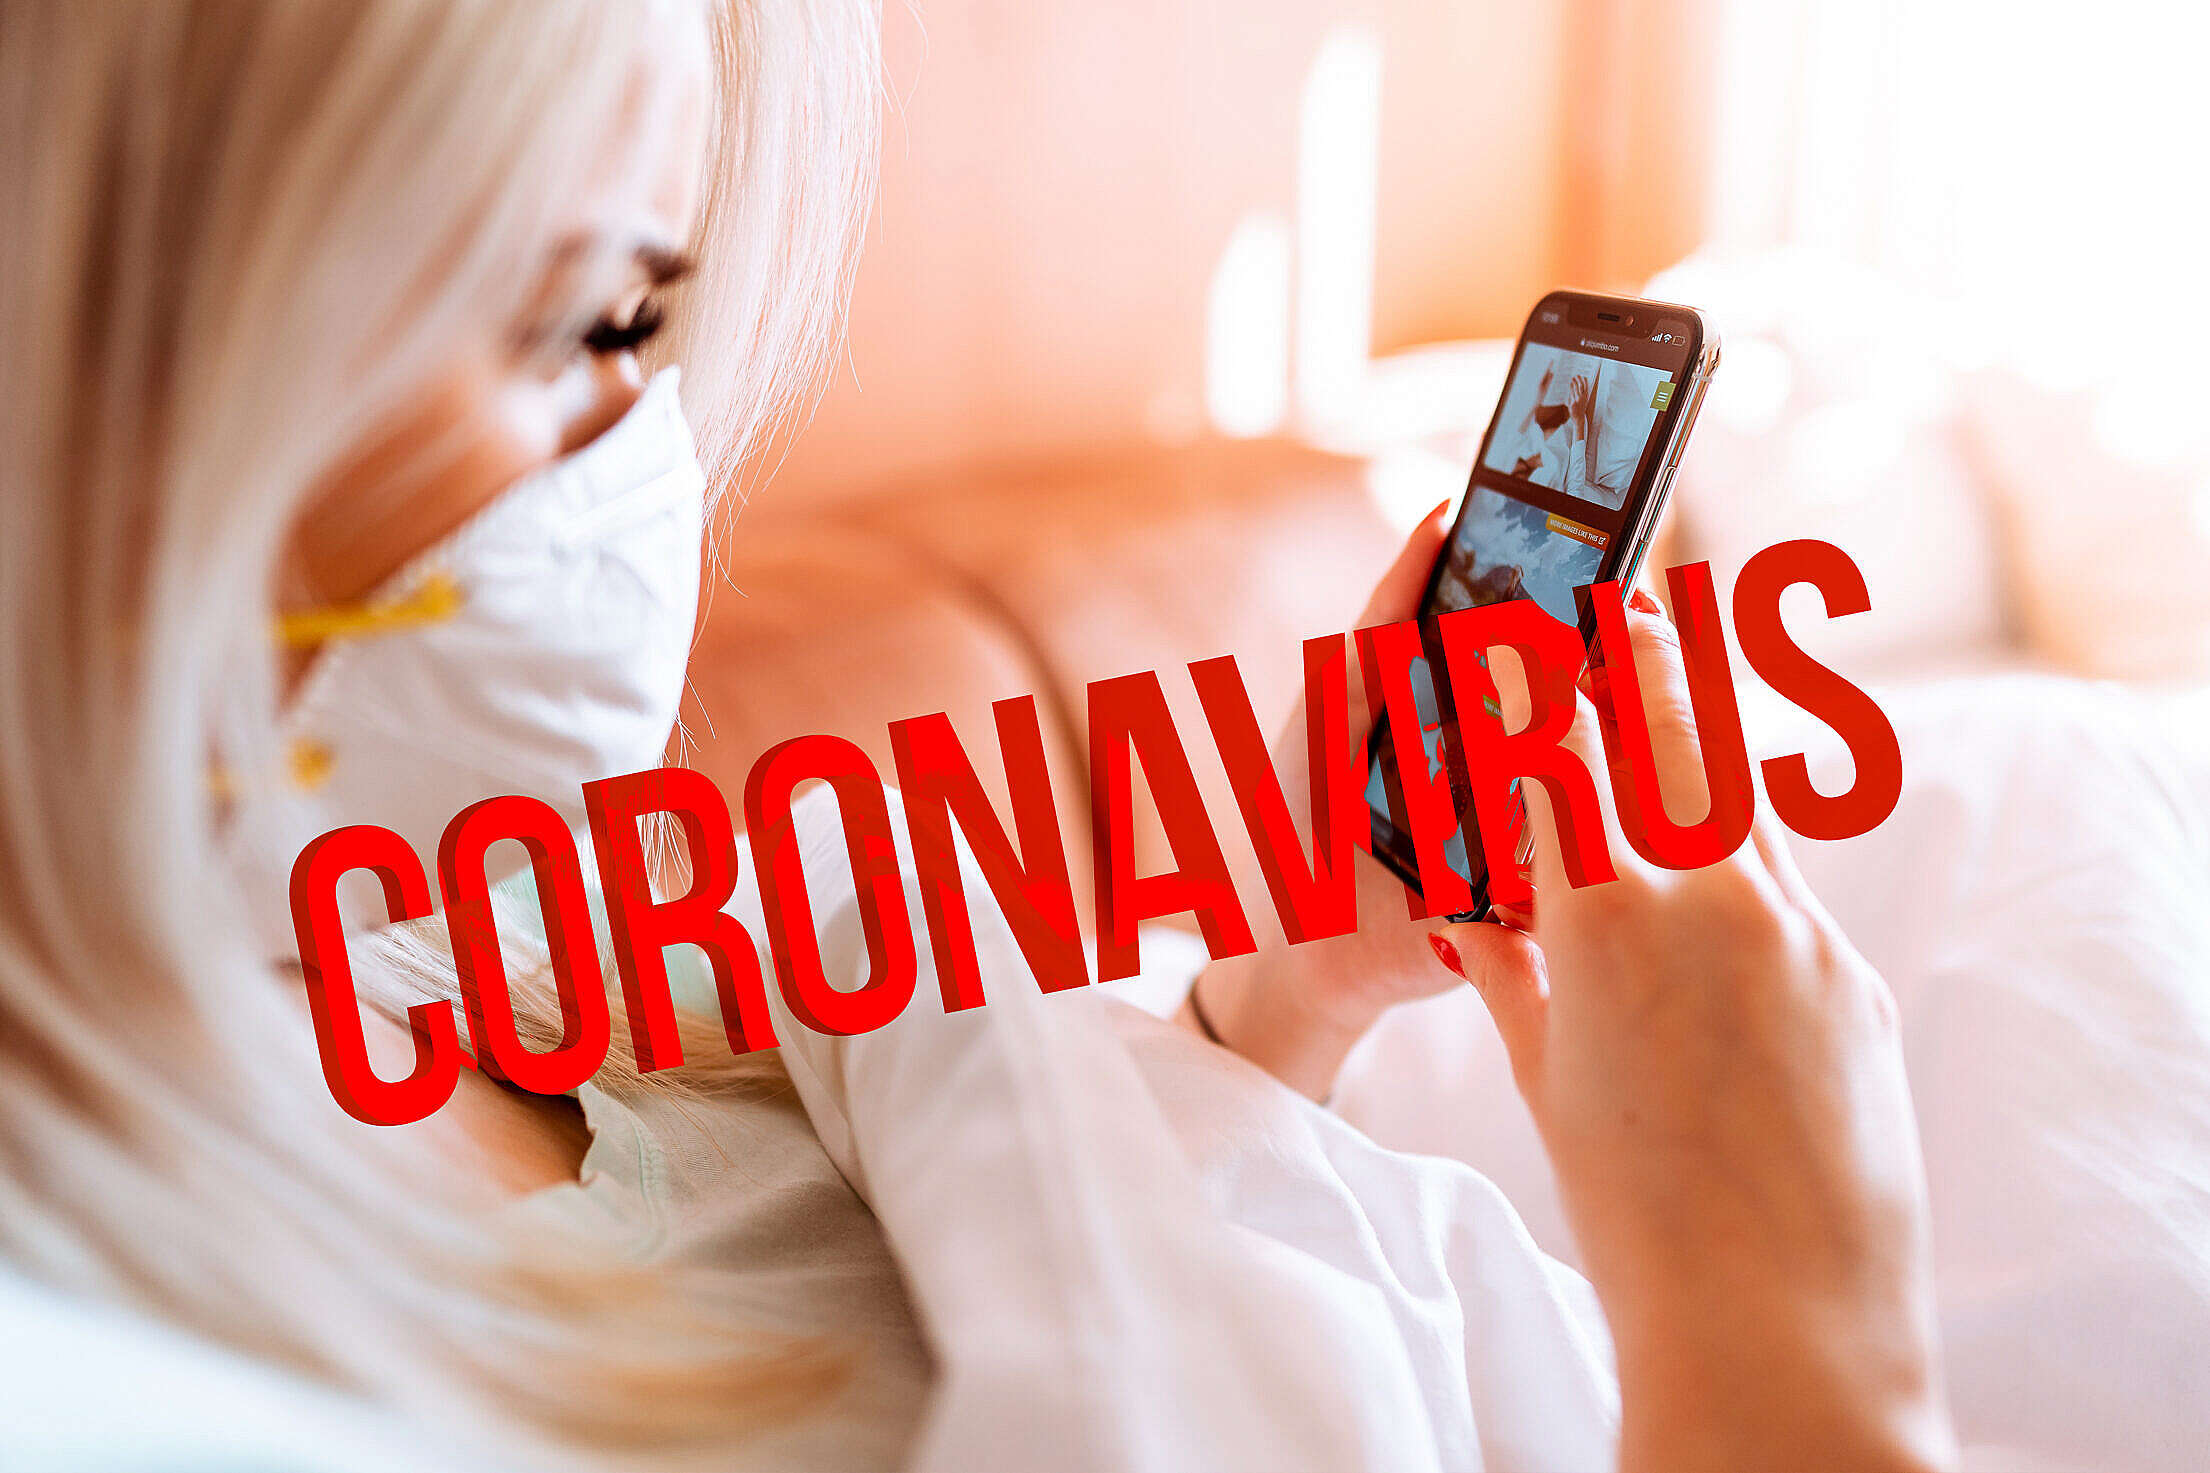 Coronavirus Self-Isolation Home Quarantine Free Stock Photo